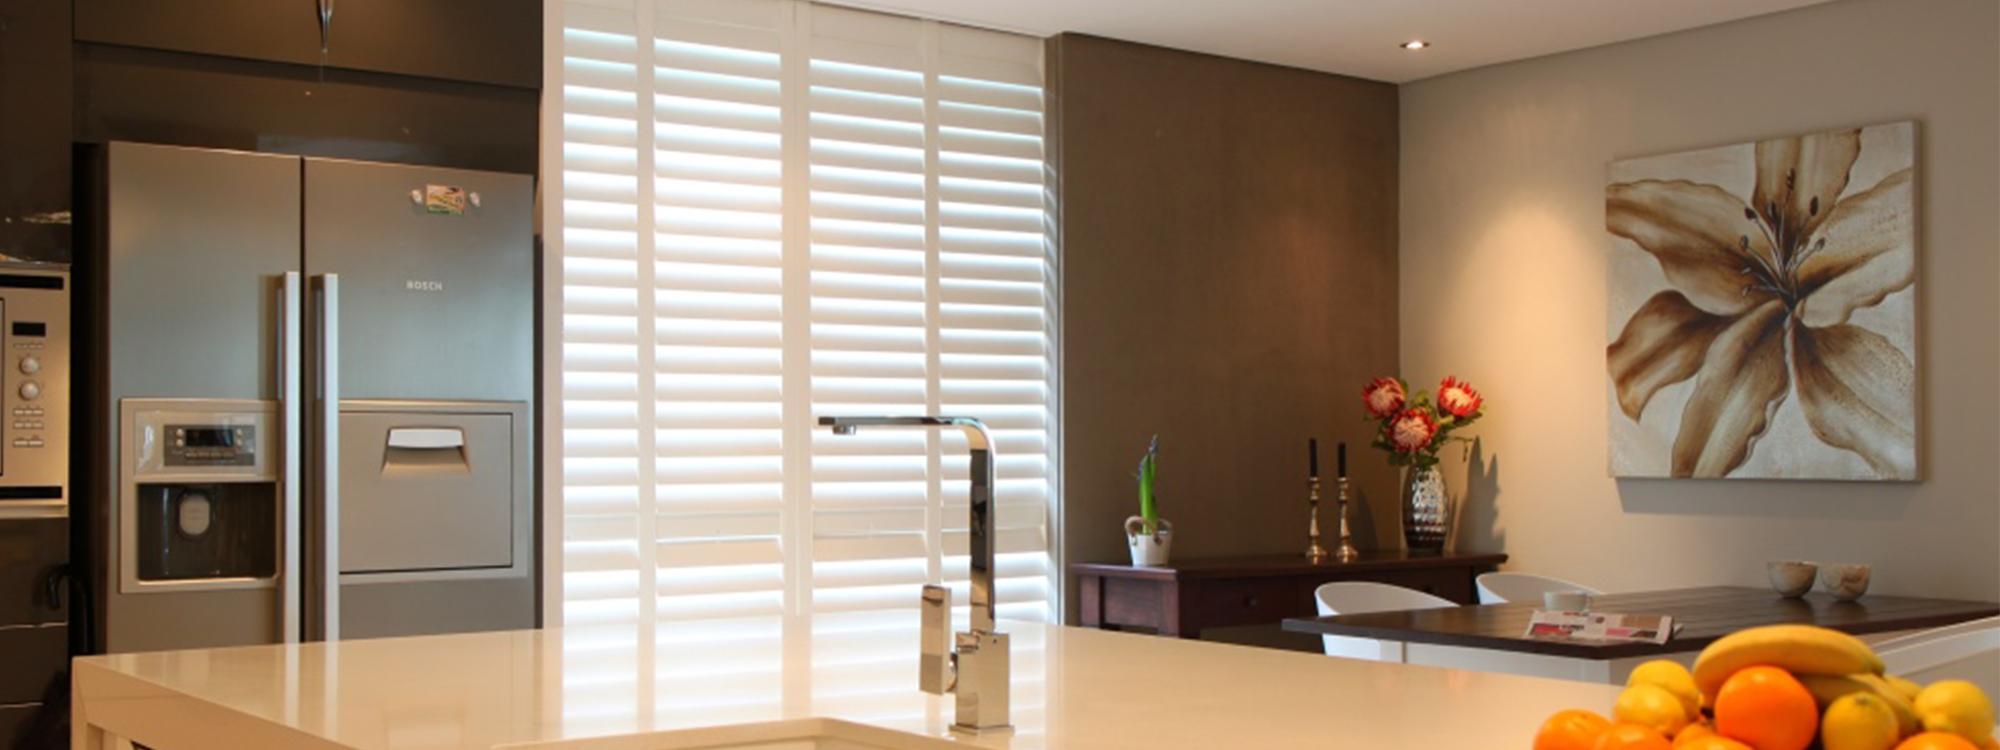 Decowood-shutters-kitchen-bi-fold